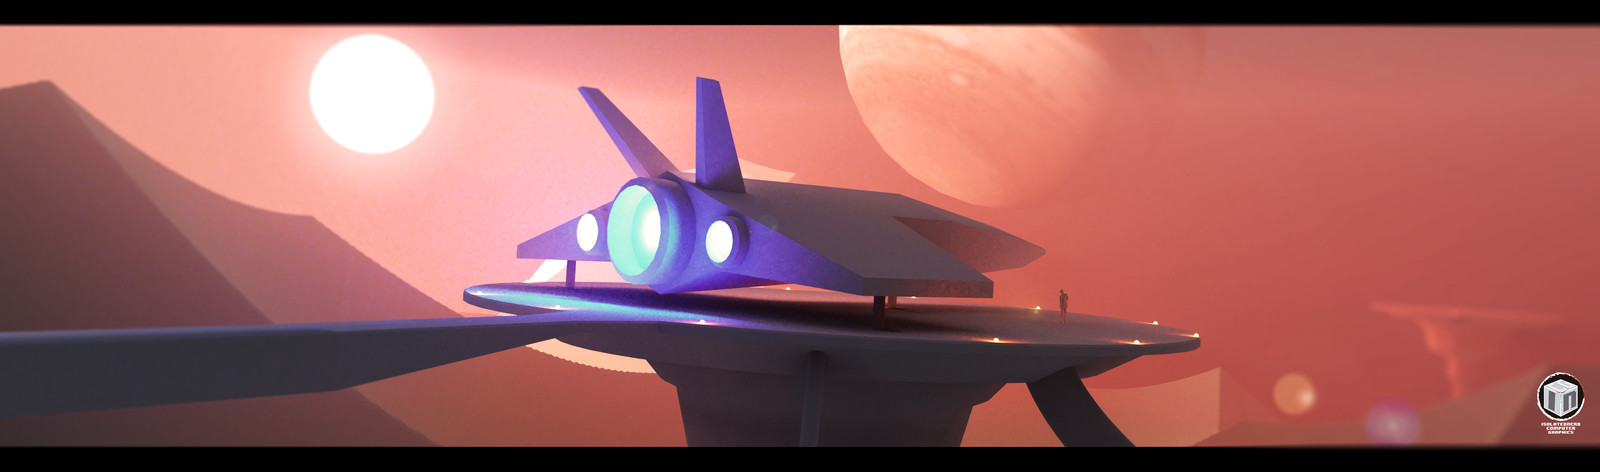 Scifi Excersice 002 - Landing Port